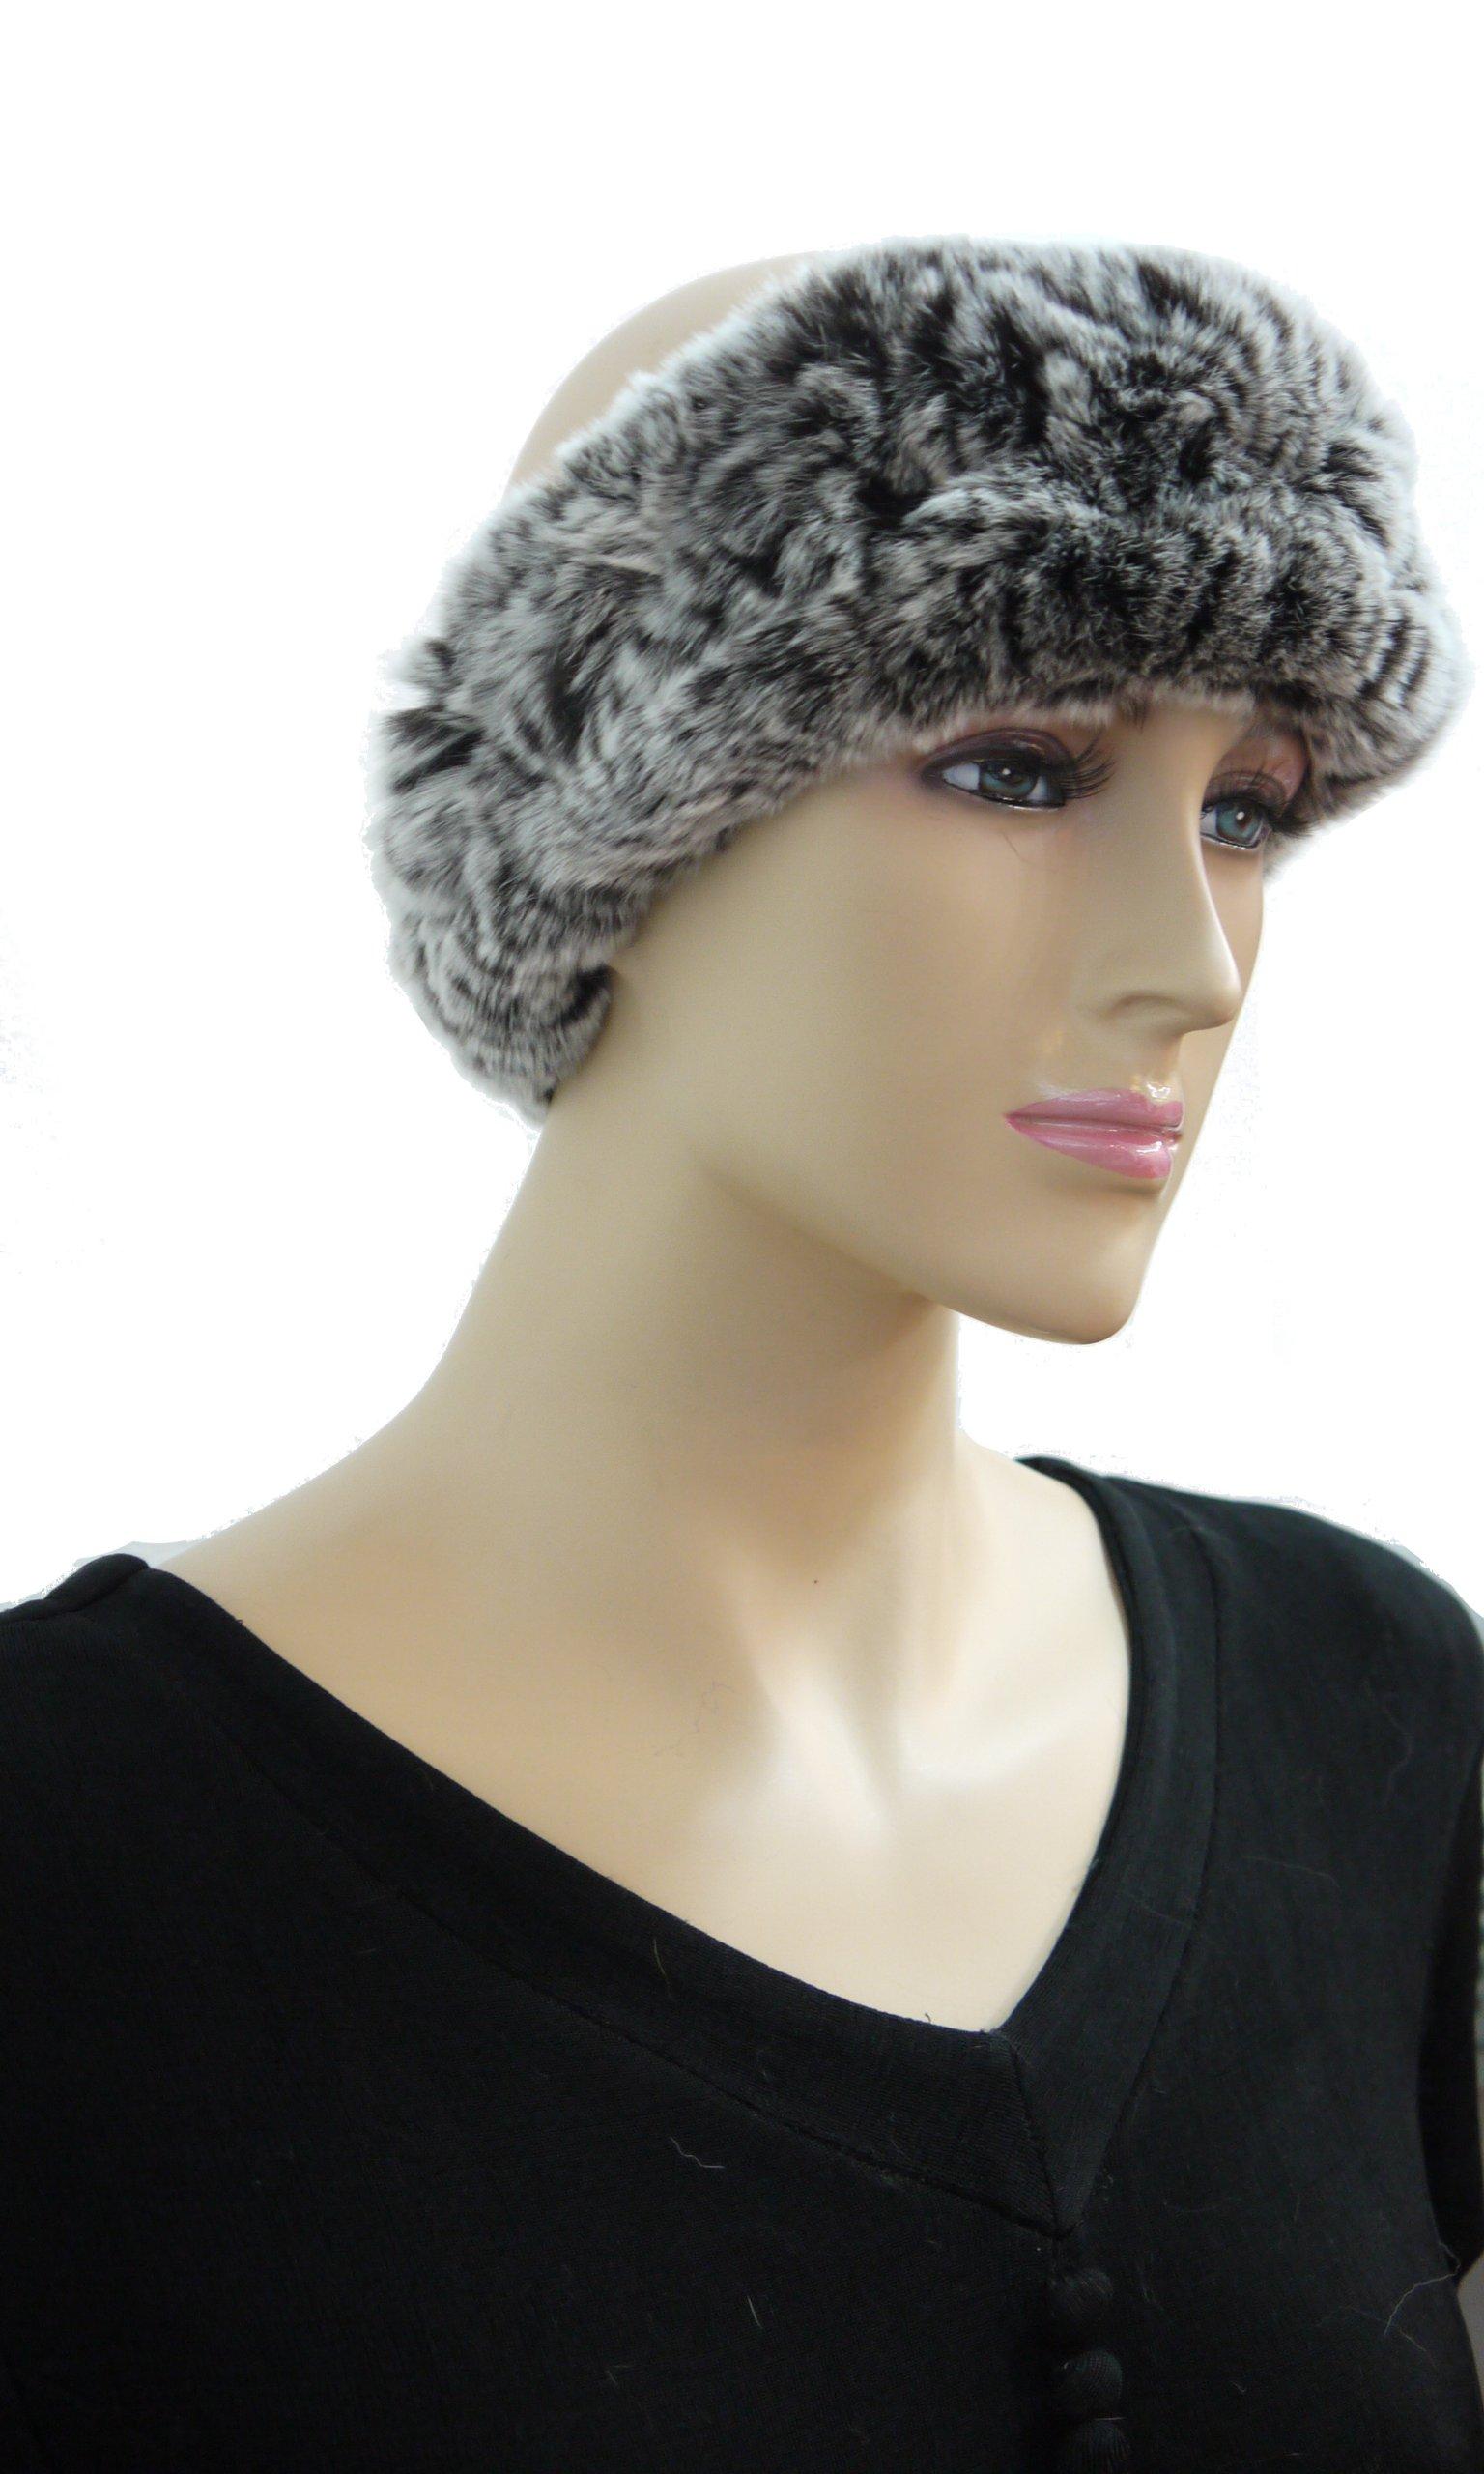 100% Rex Rabbit Fur Headband - Black Frosted